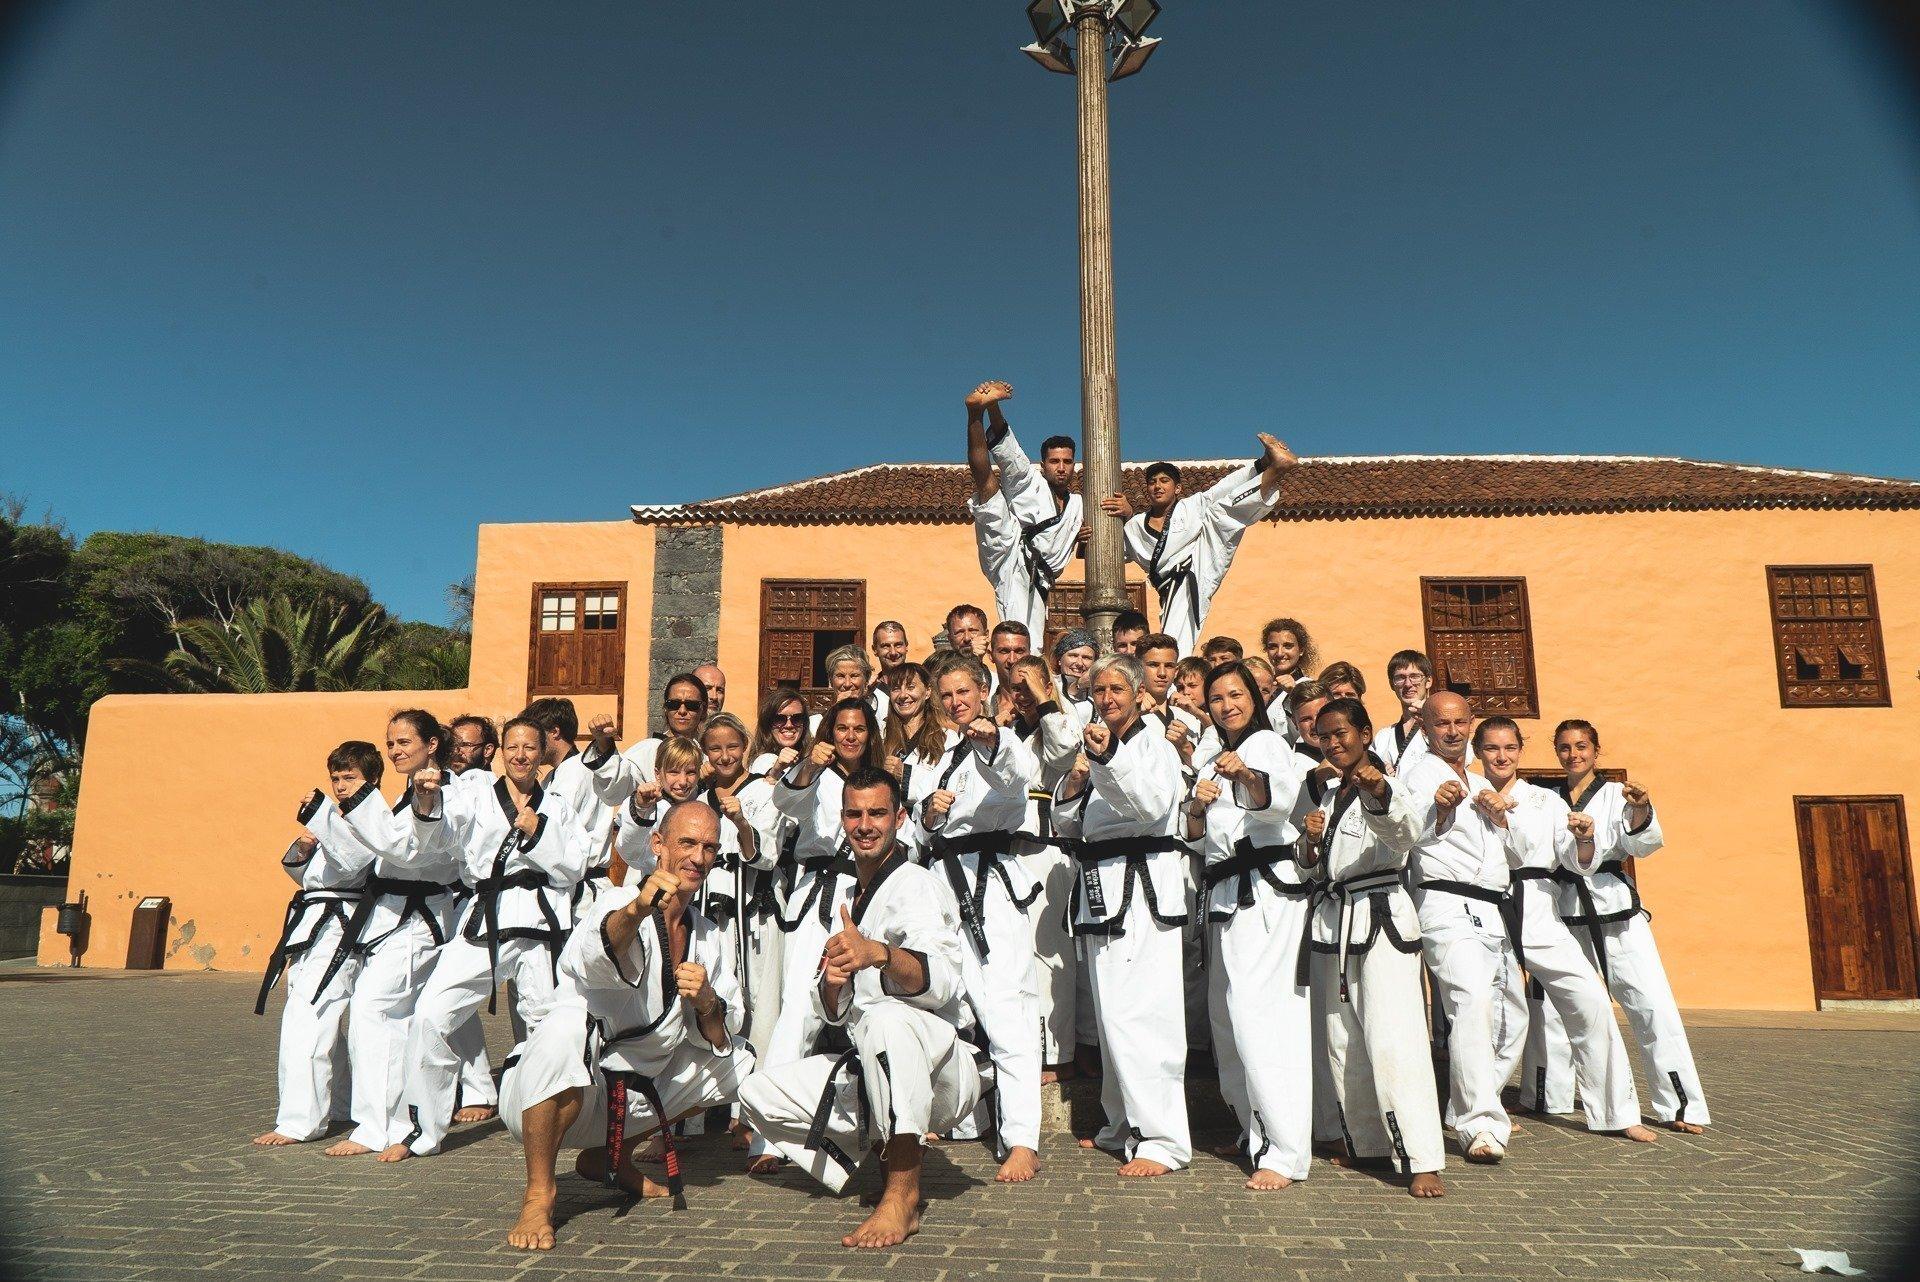 YOUNG-UNG Taekwondo Teneriffa Camp Training